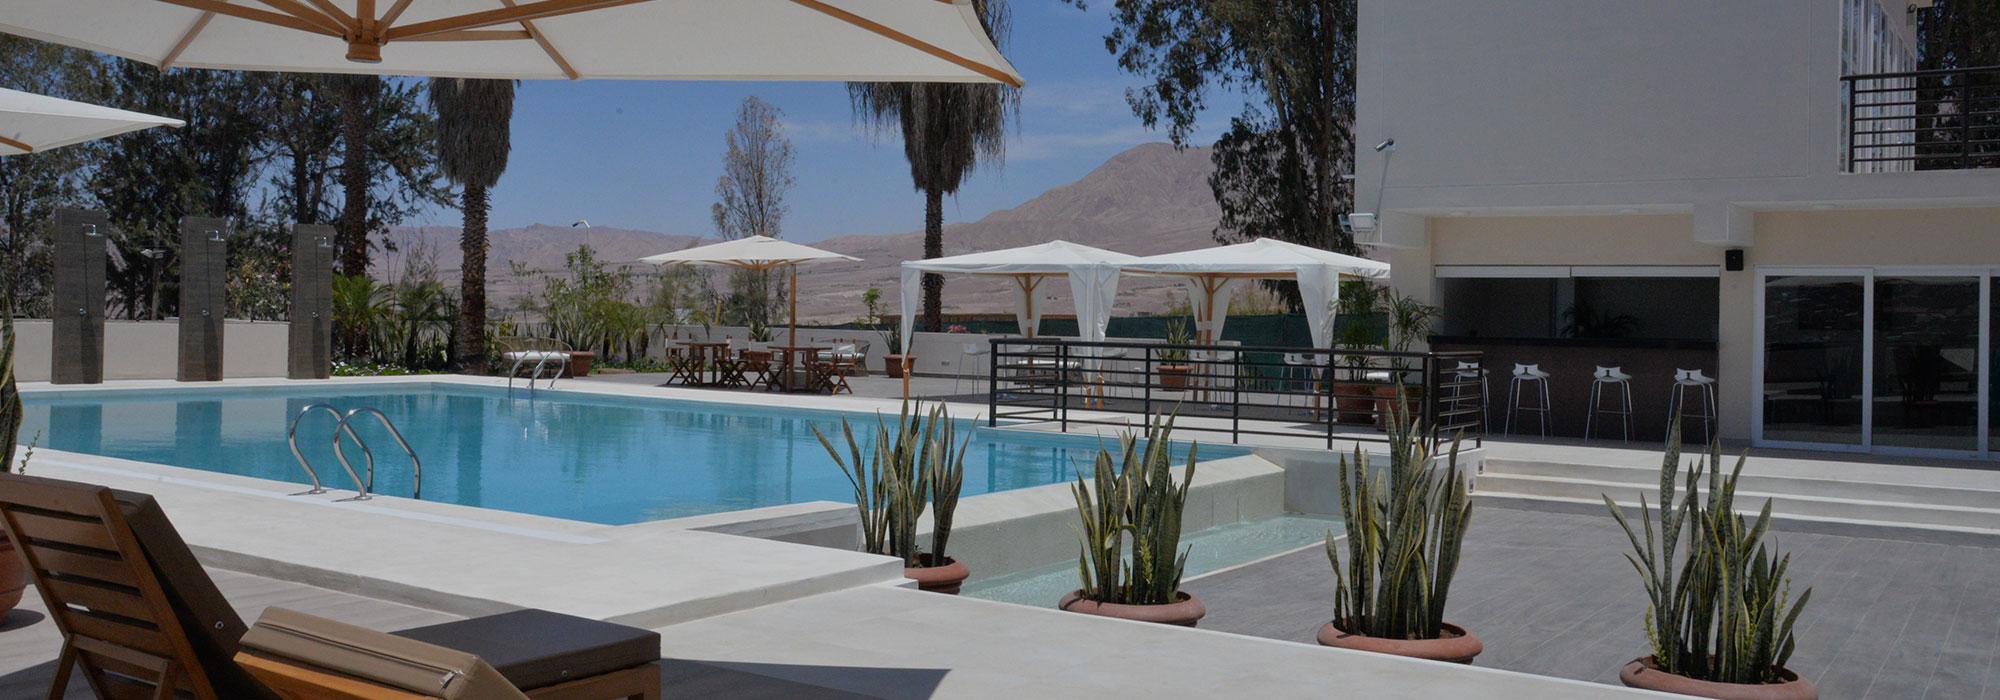 dm-hoteles-peru-moquegua-banner-home